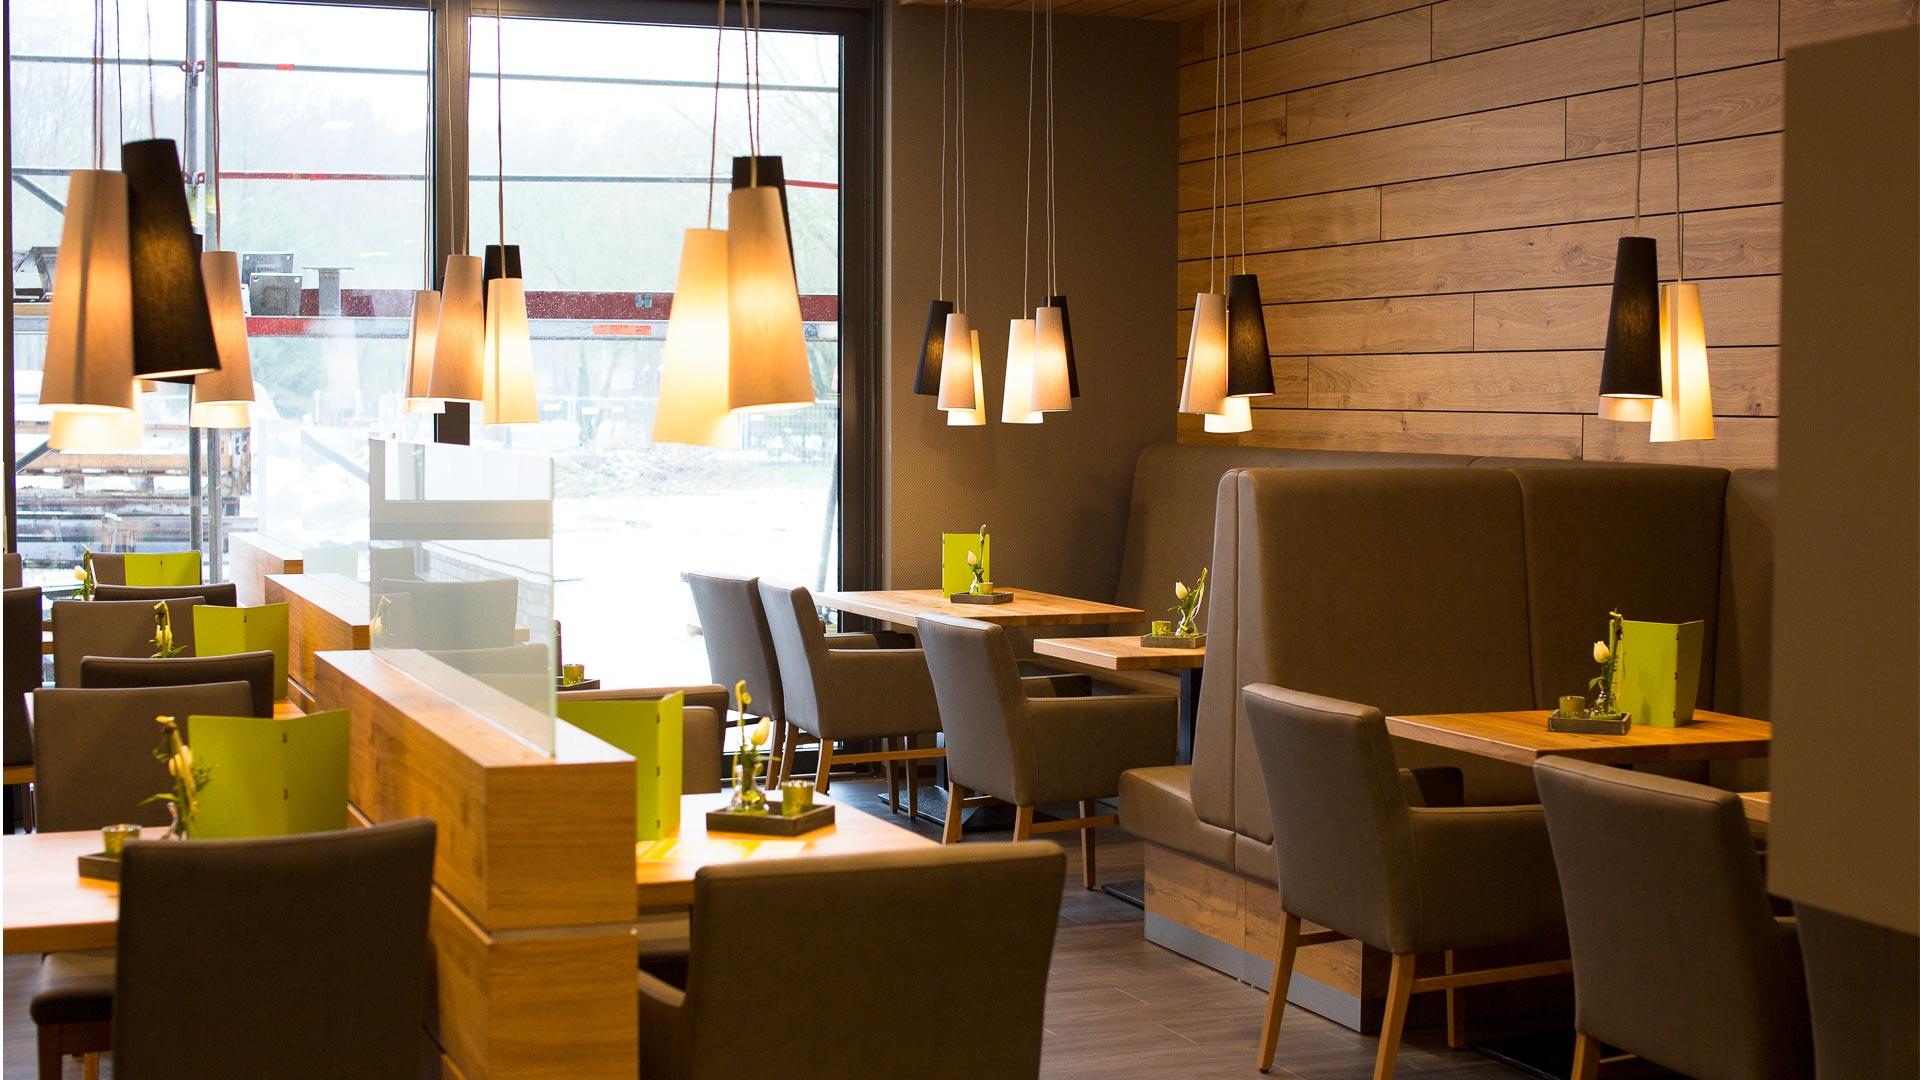 MAASS-Lichtplanung_Lichtplanung für Gastronomiebereich__MAASS-Auszeit-Gastronomie-006